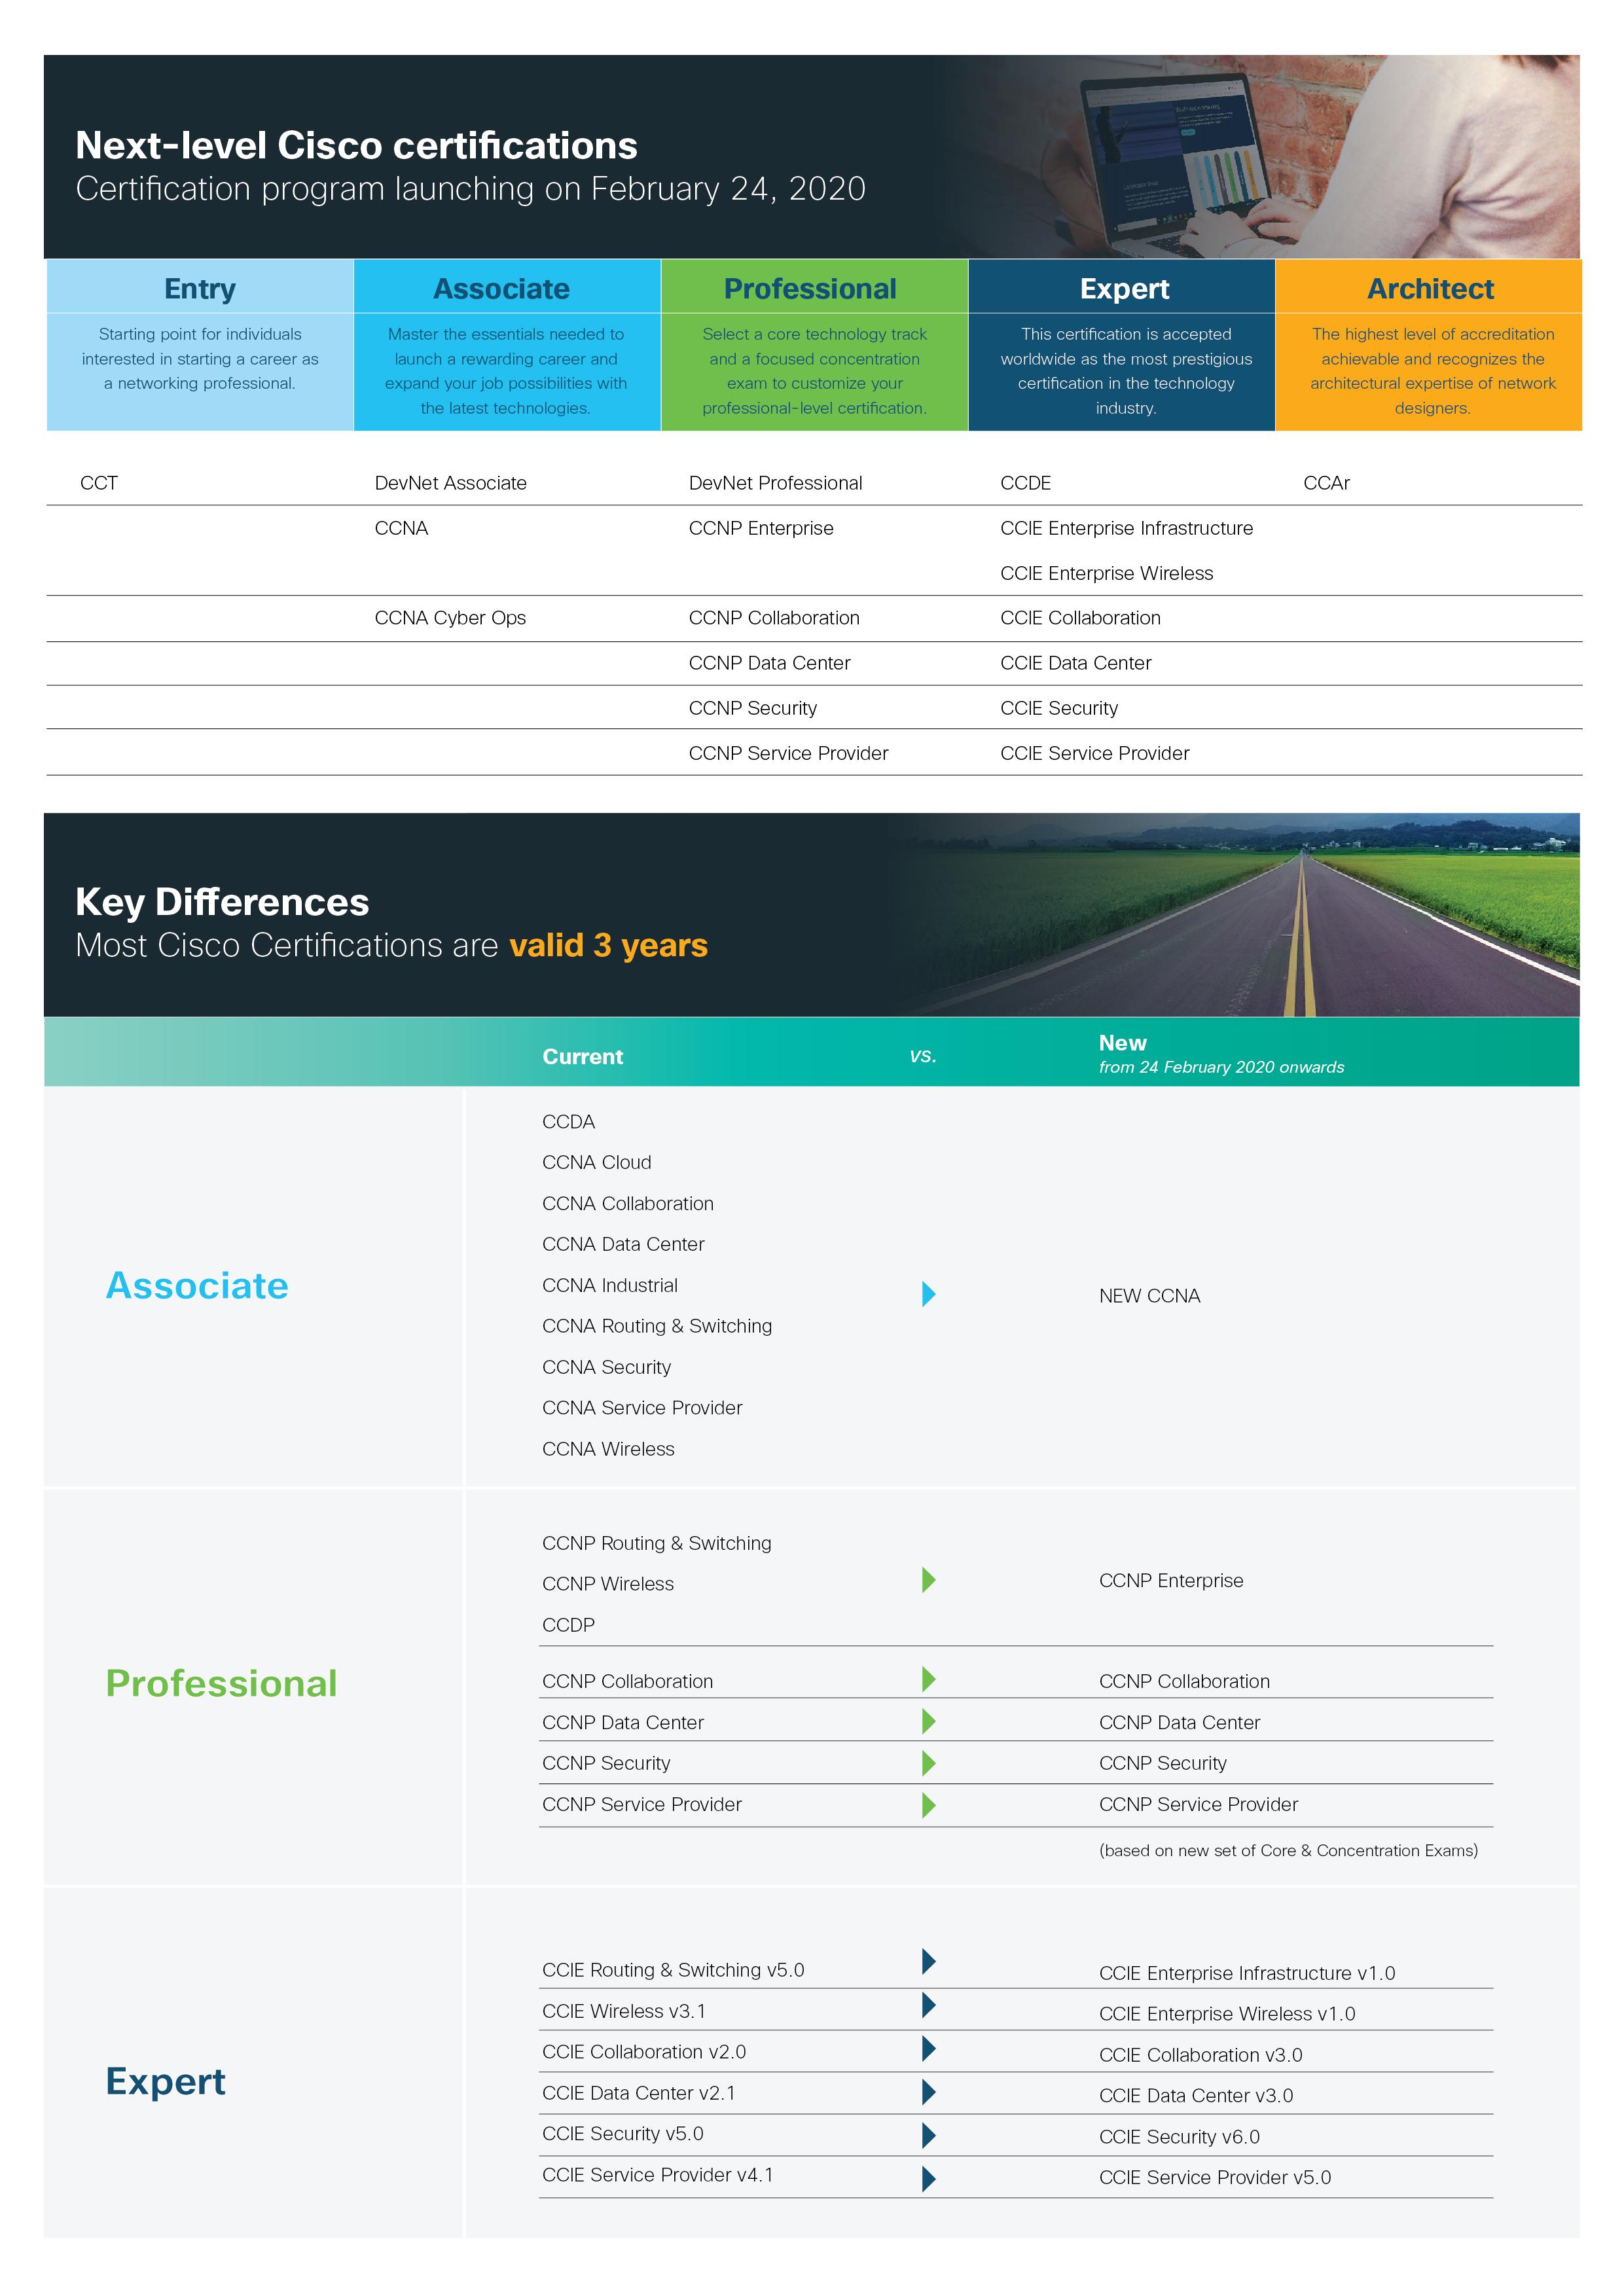 Cisco Certification roadmap-01